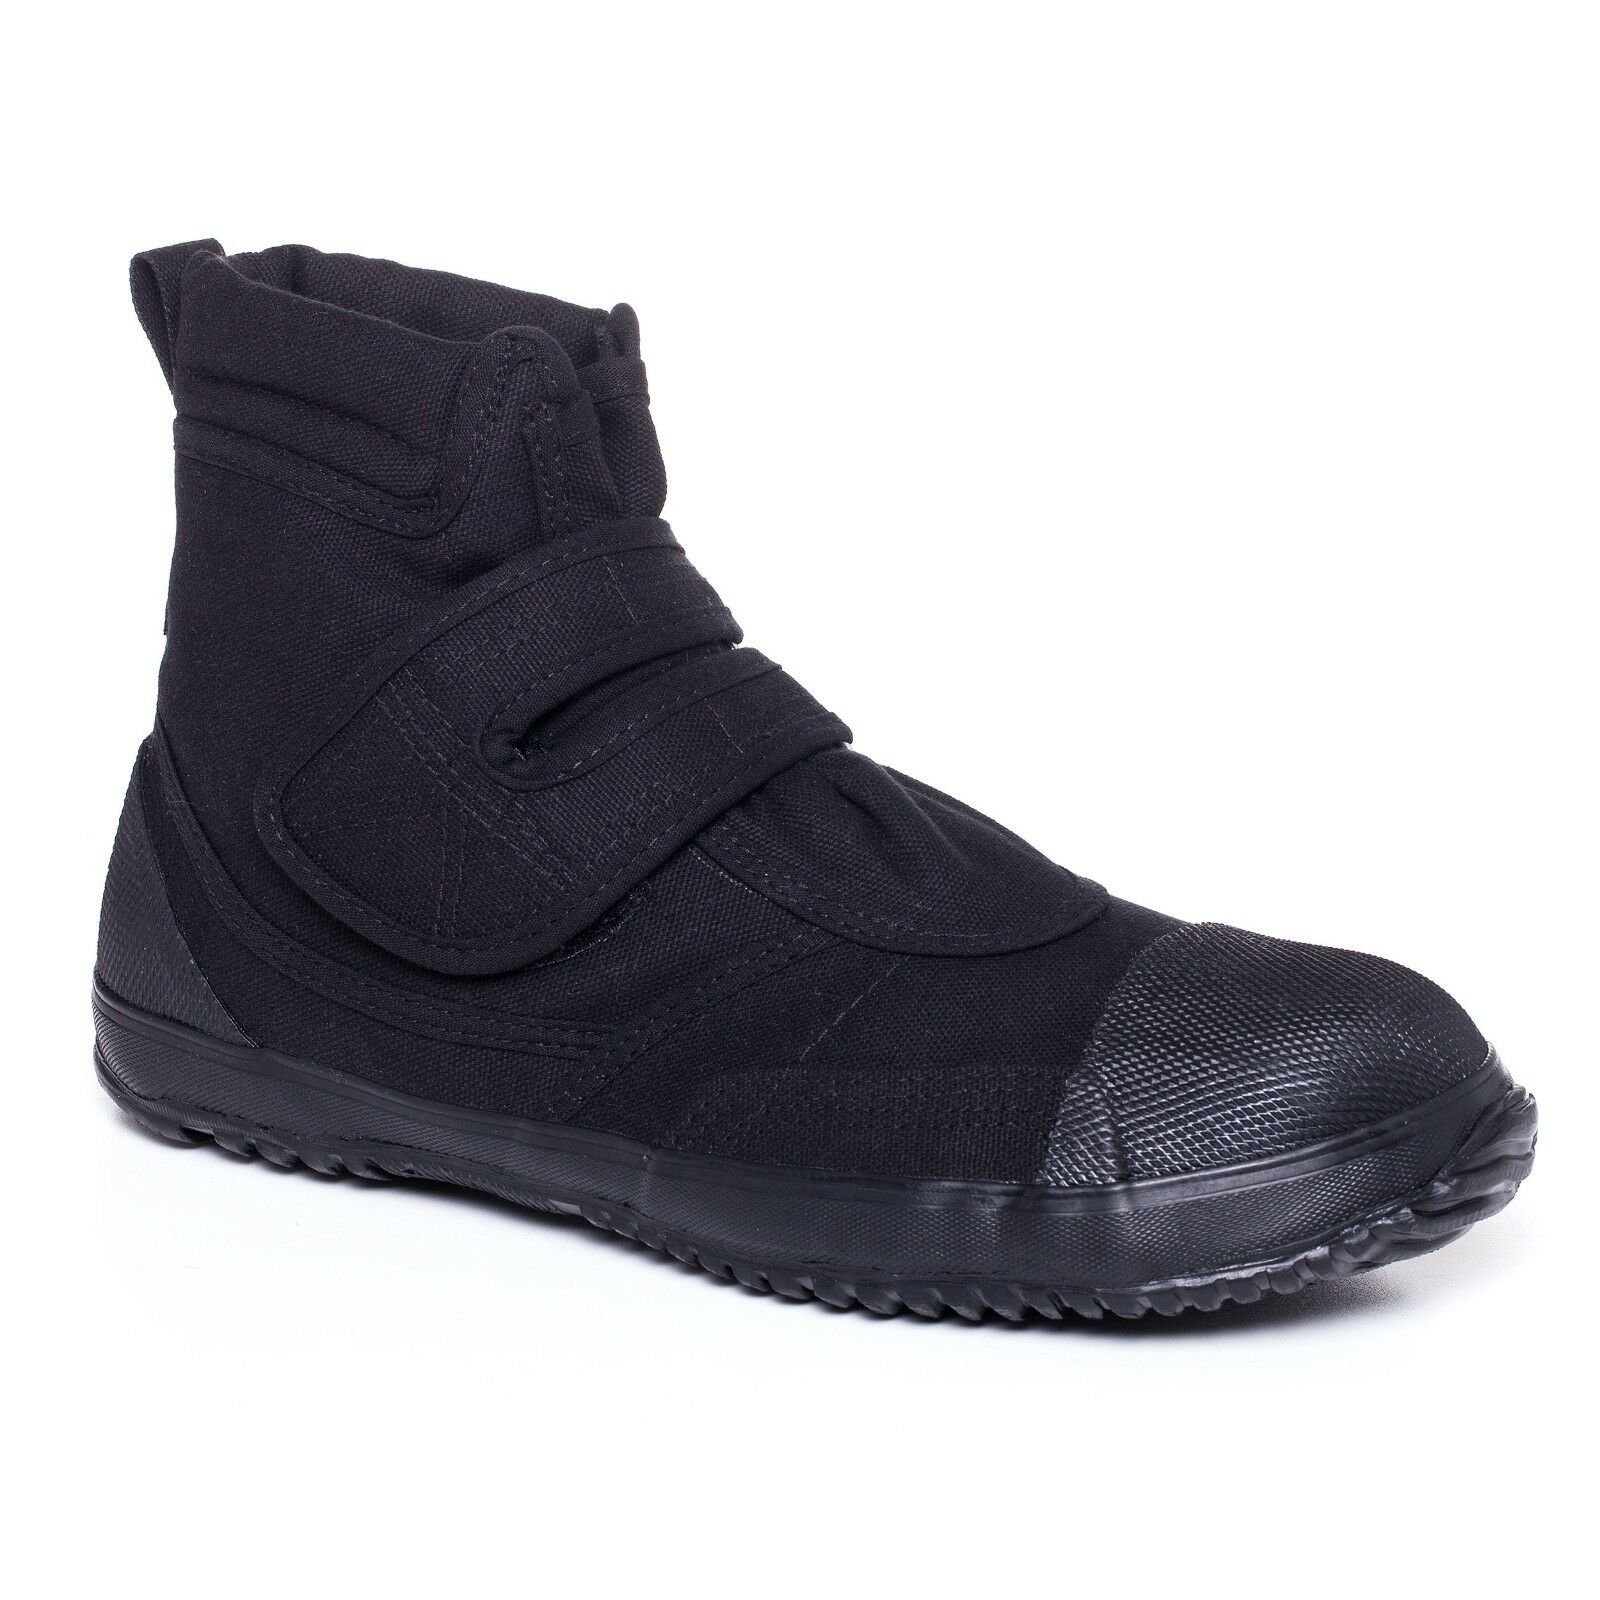 Black Black Black Fugu Sa-Ba Unisex Japanese shoes & Boots. Perfect Burning Man shoes e6c373